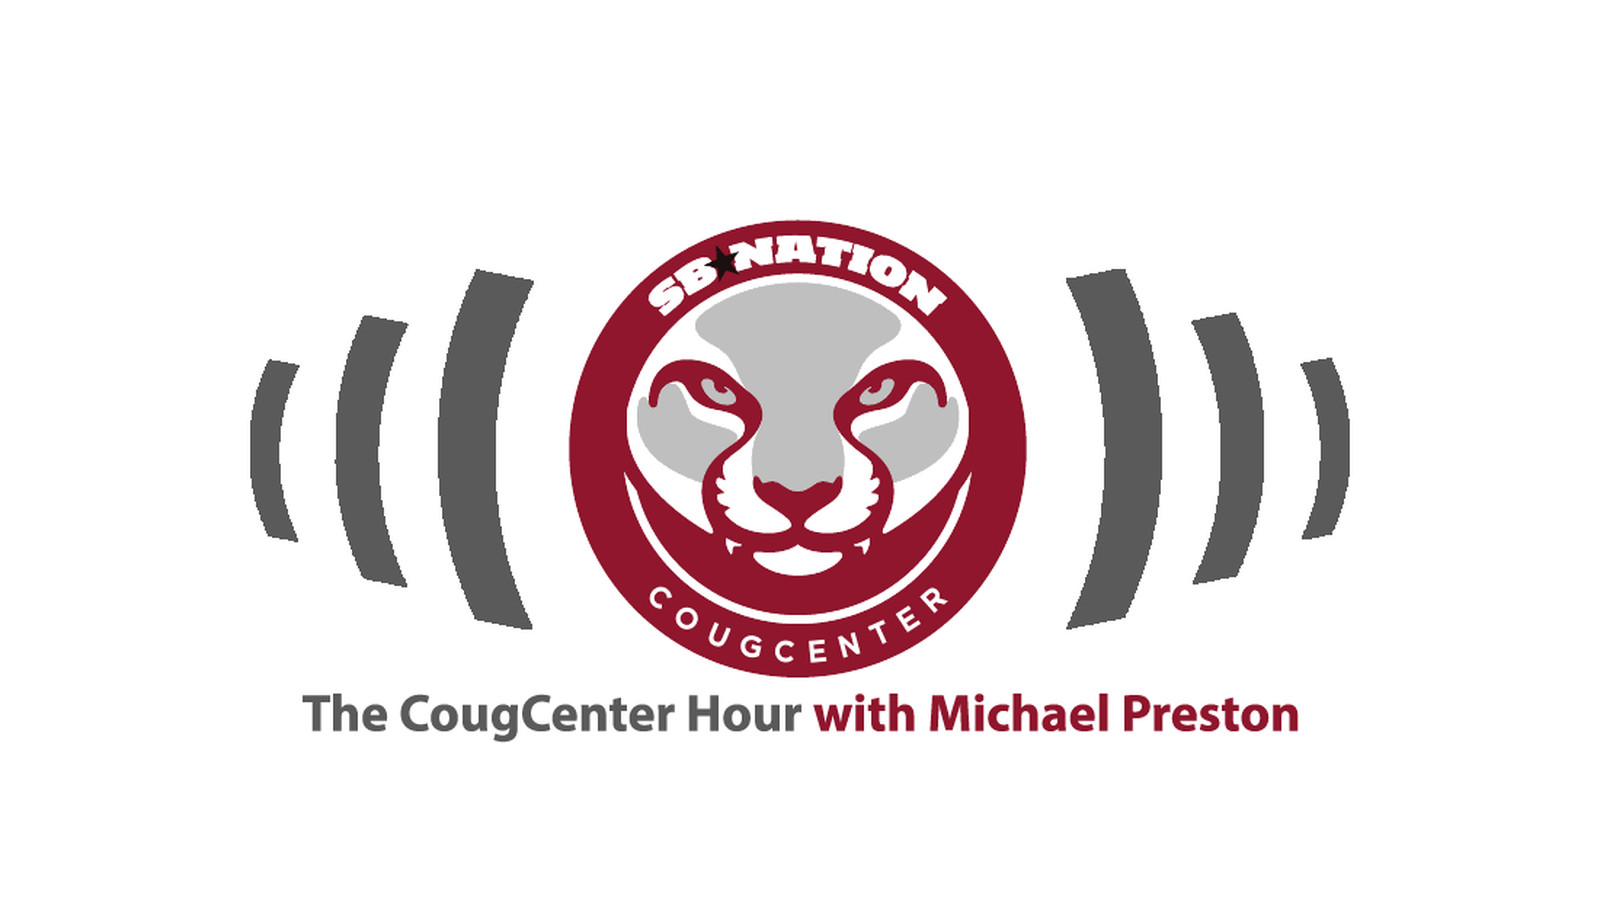 Cougcenter_hour.0